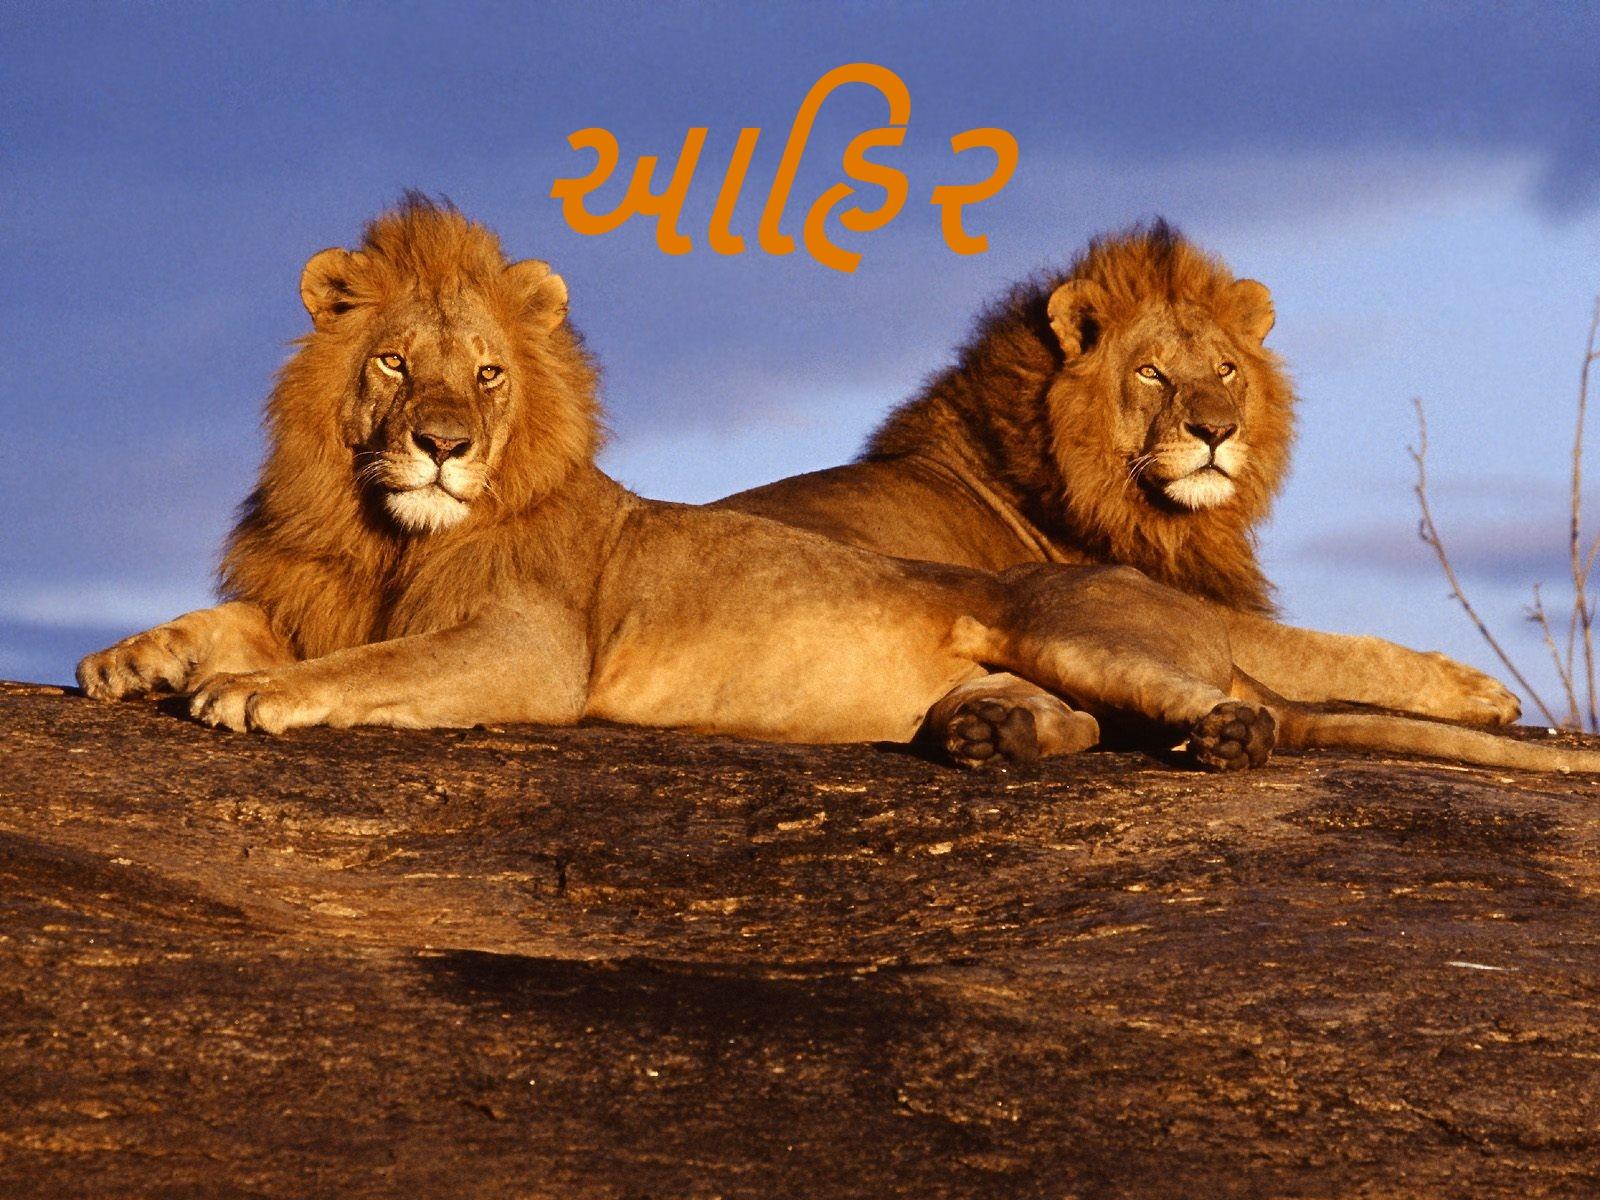 Most Inspiring Wallpaper Name Mahesh - The-best-top-desktop-lion-wallpapers-hd-lion-wallpaper-13  Perfect Image Reference_303911.jpg